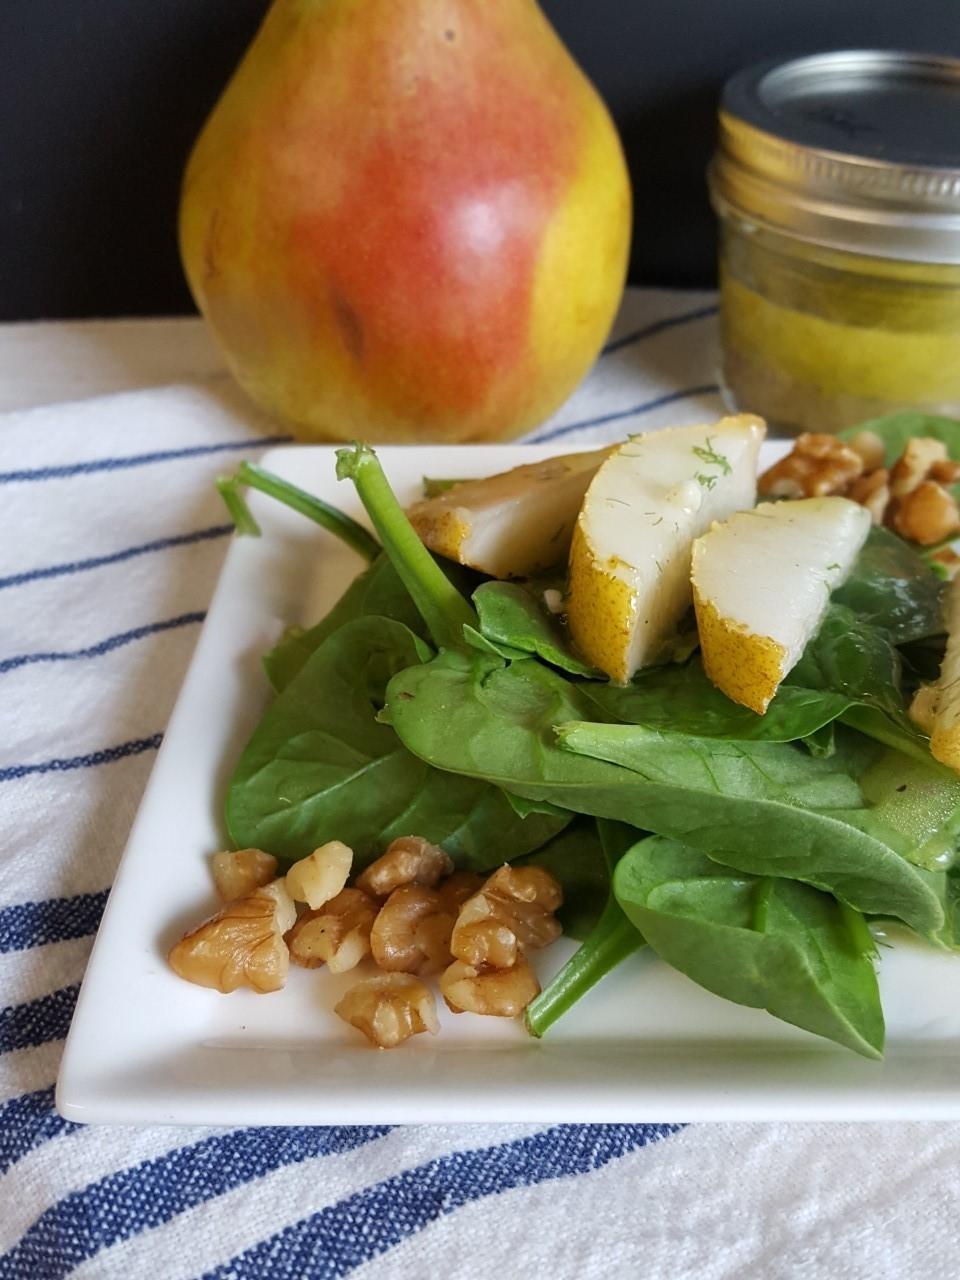 Spinach Pear Salad with Meyer Lemon Vinaigrette